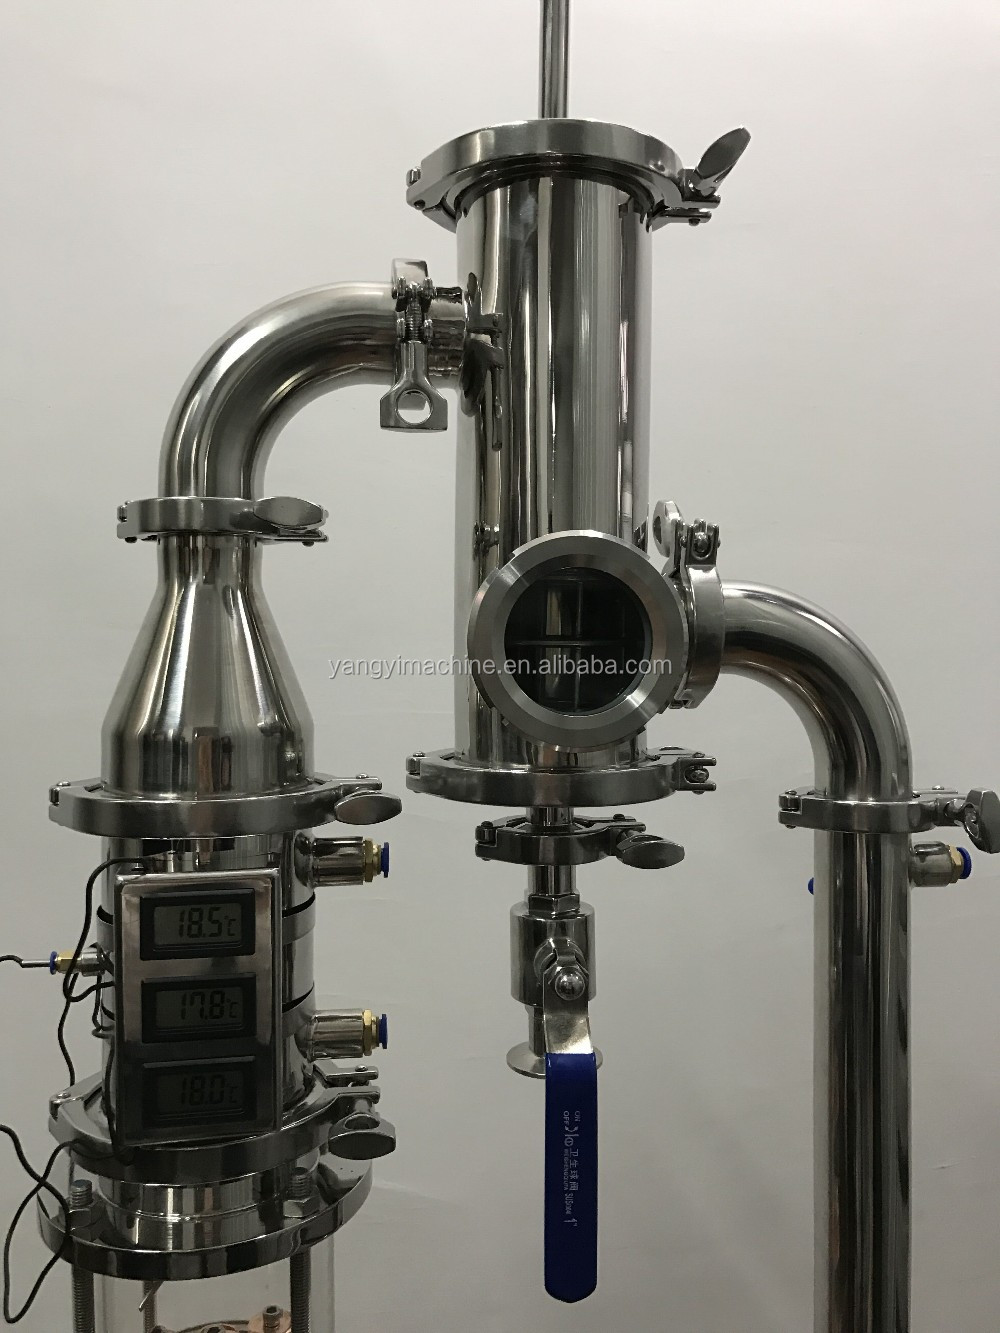 New Type Glass Distillation Column Pot Still Alcohol